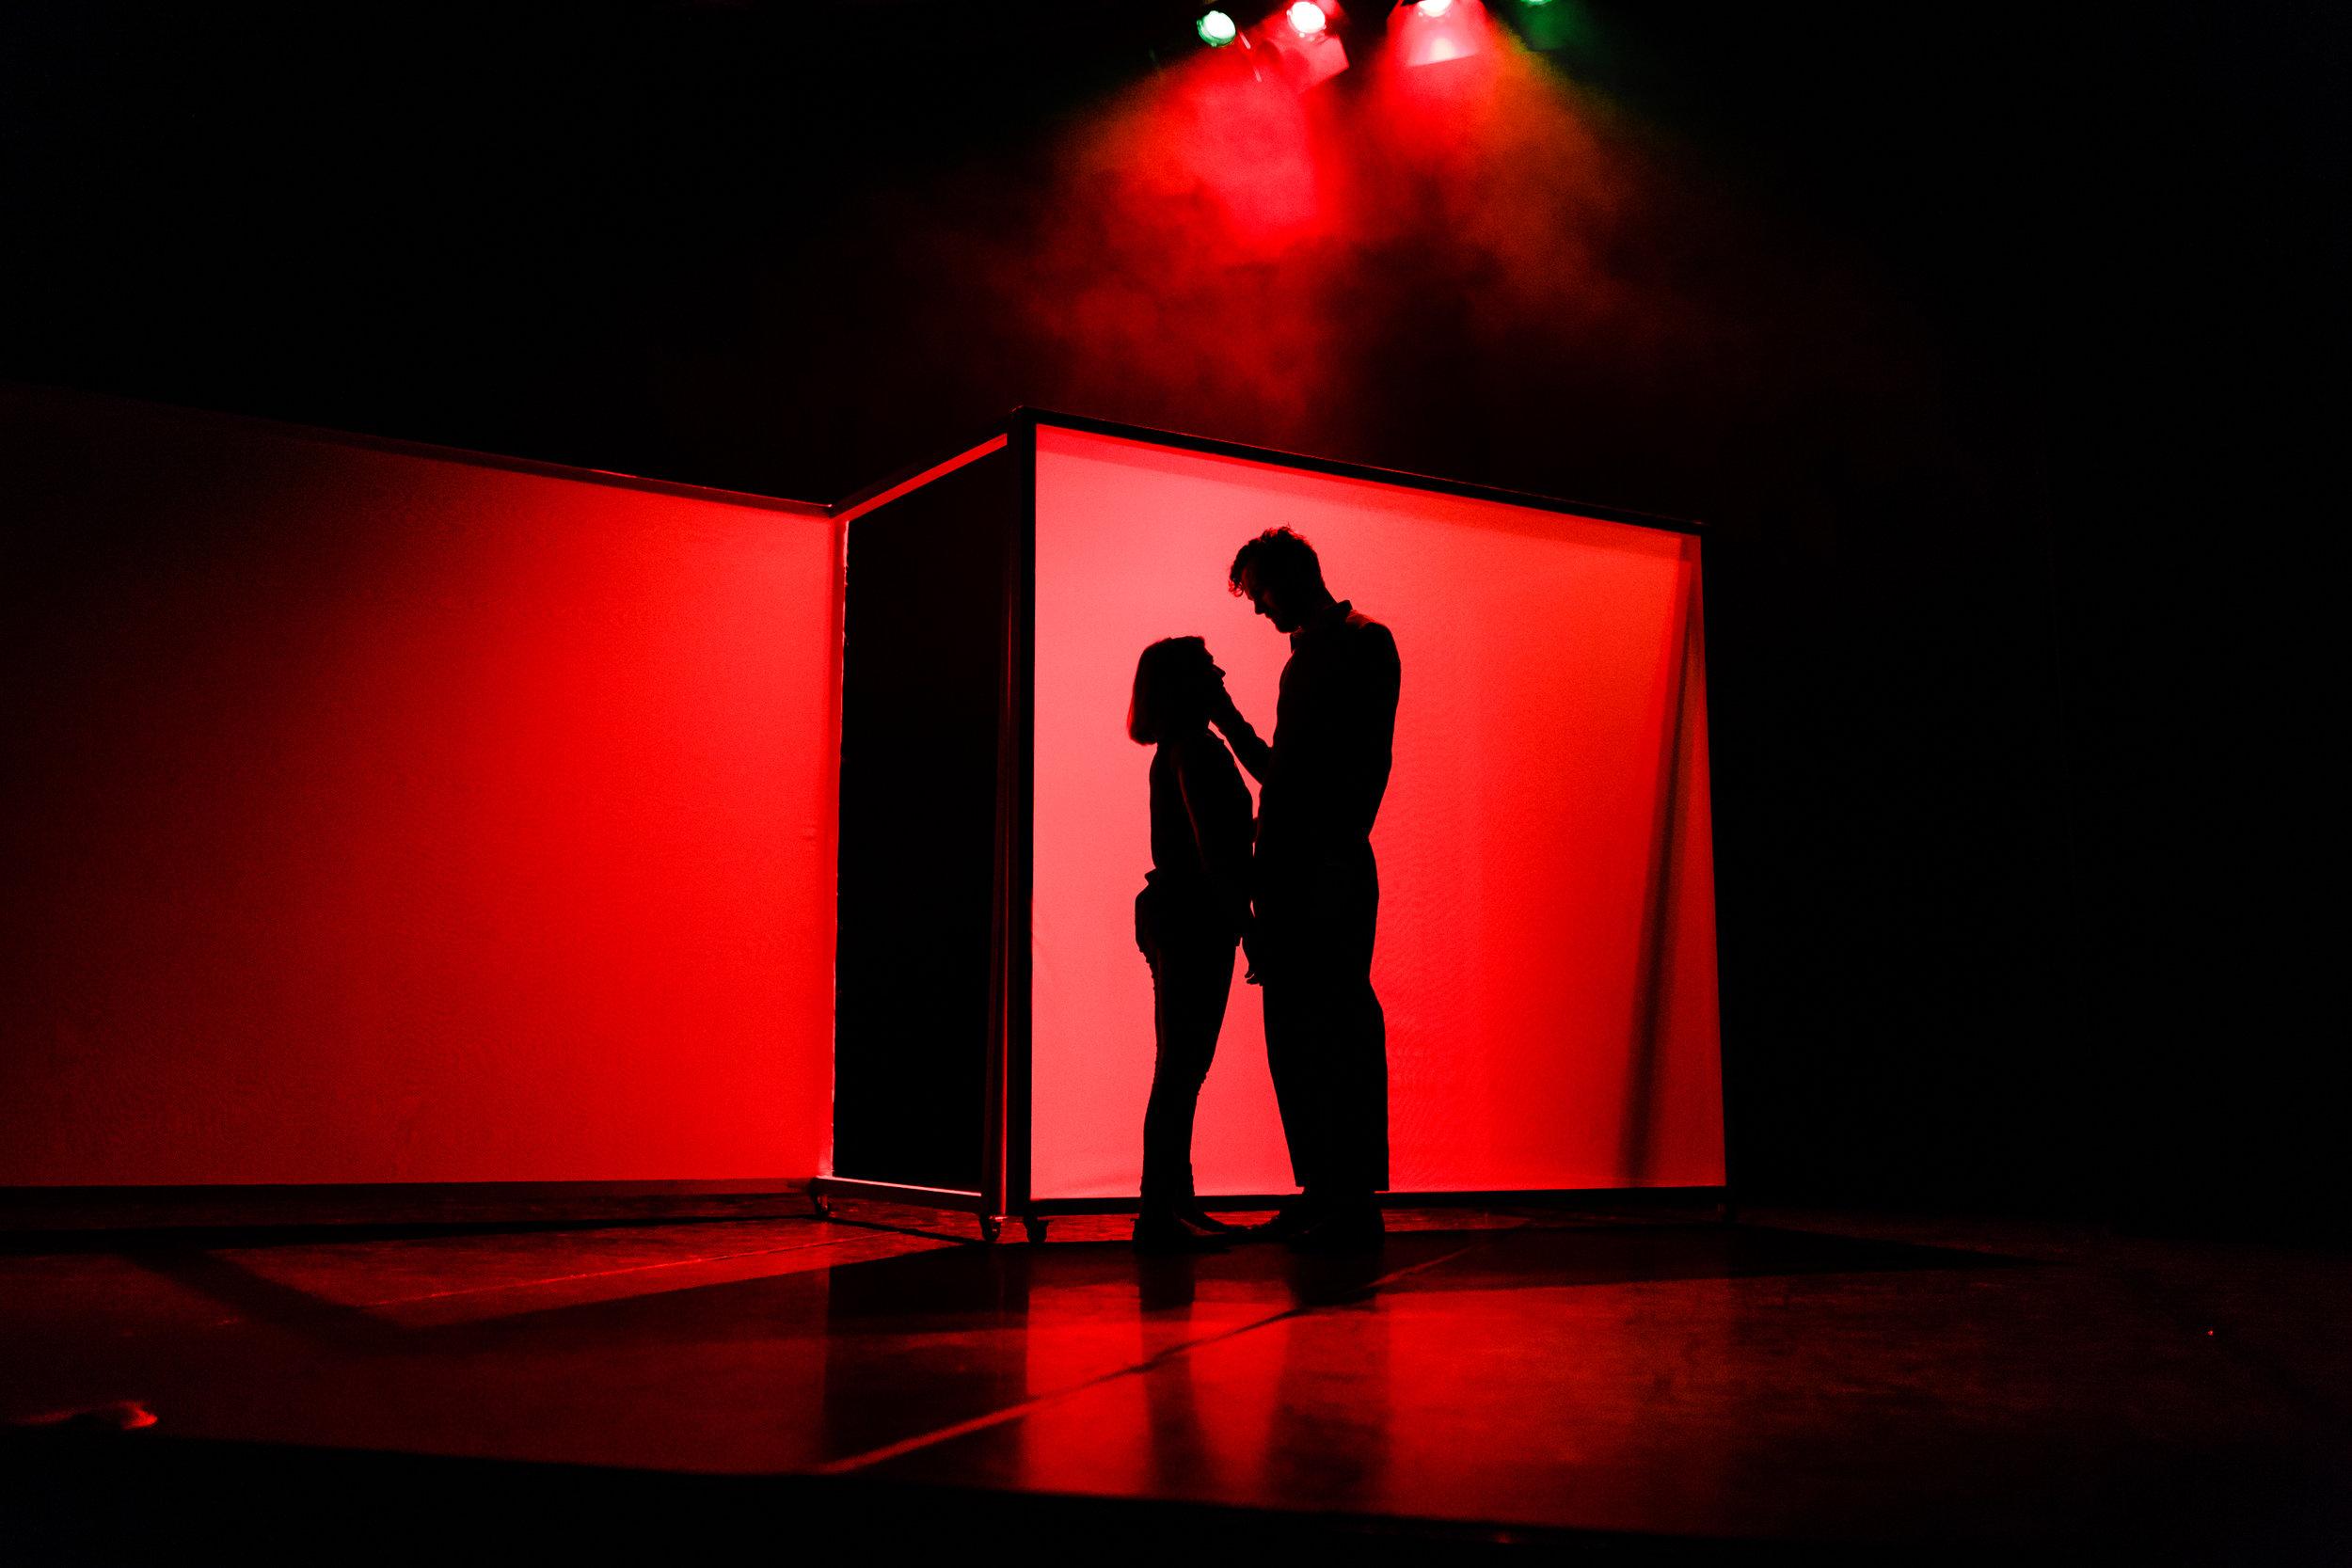 Love and Information-edit-  Rob watts- oct 17-  (166 of 339).jpg